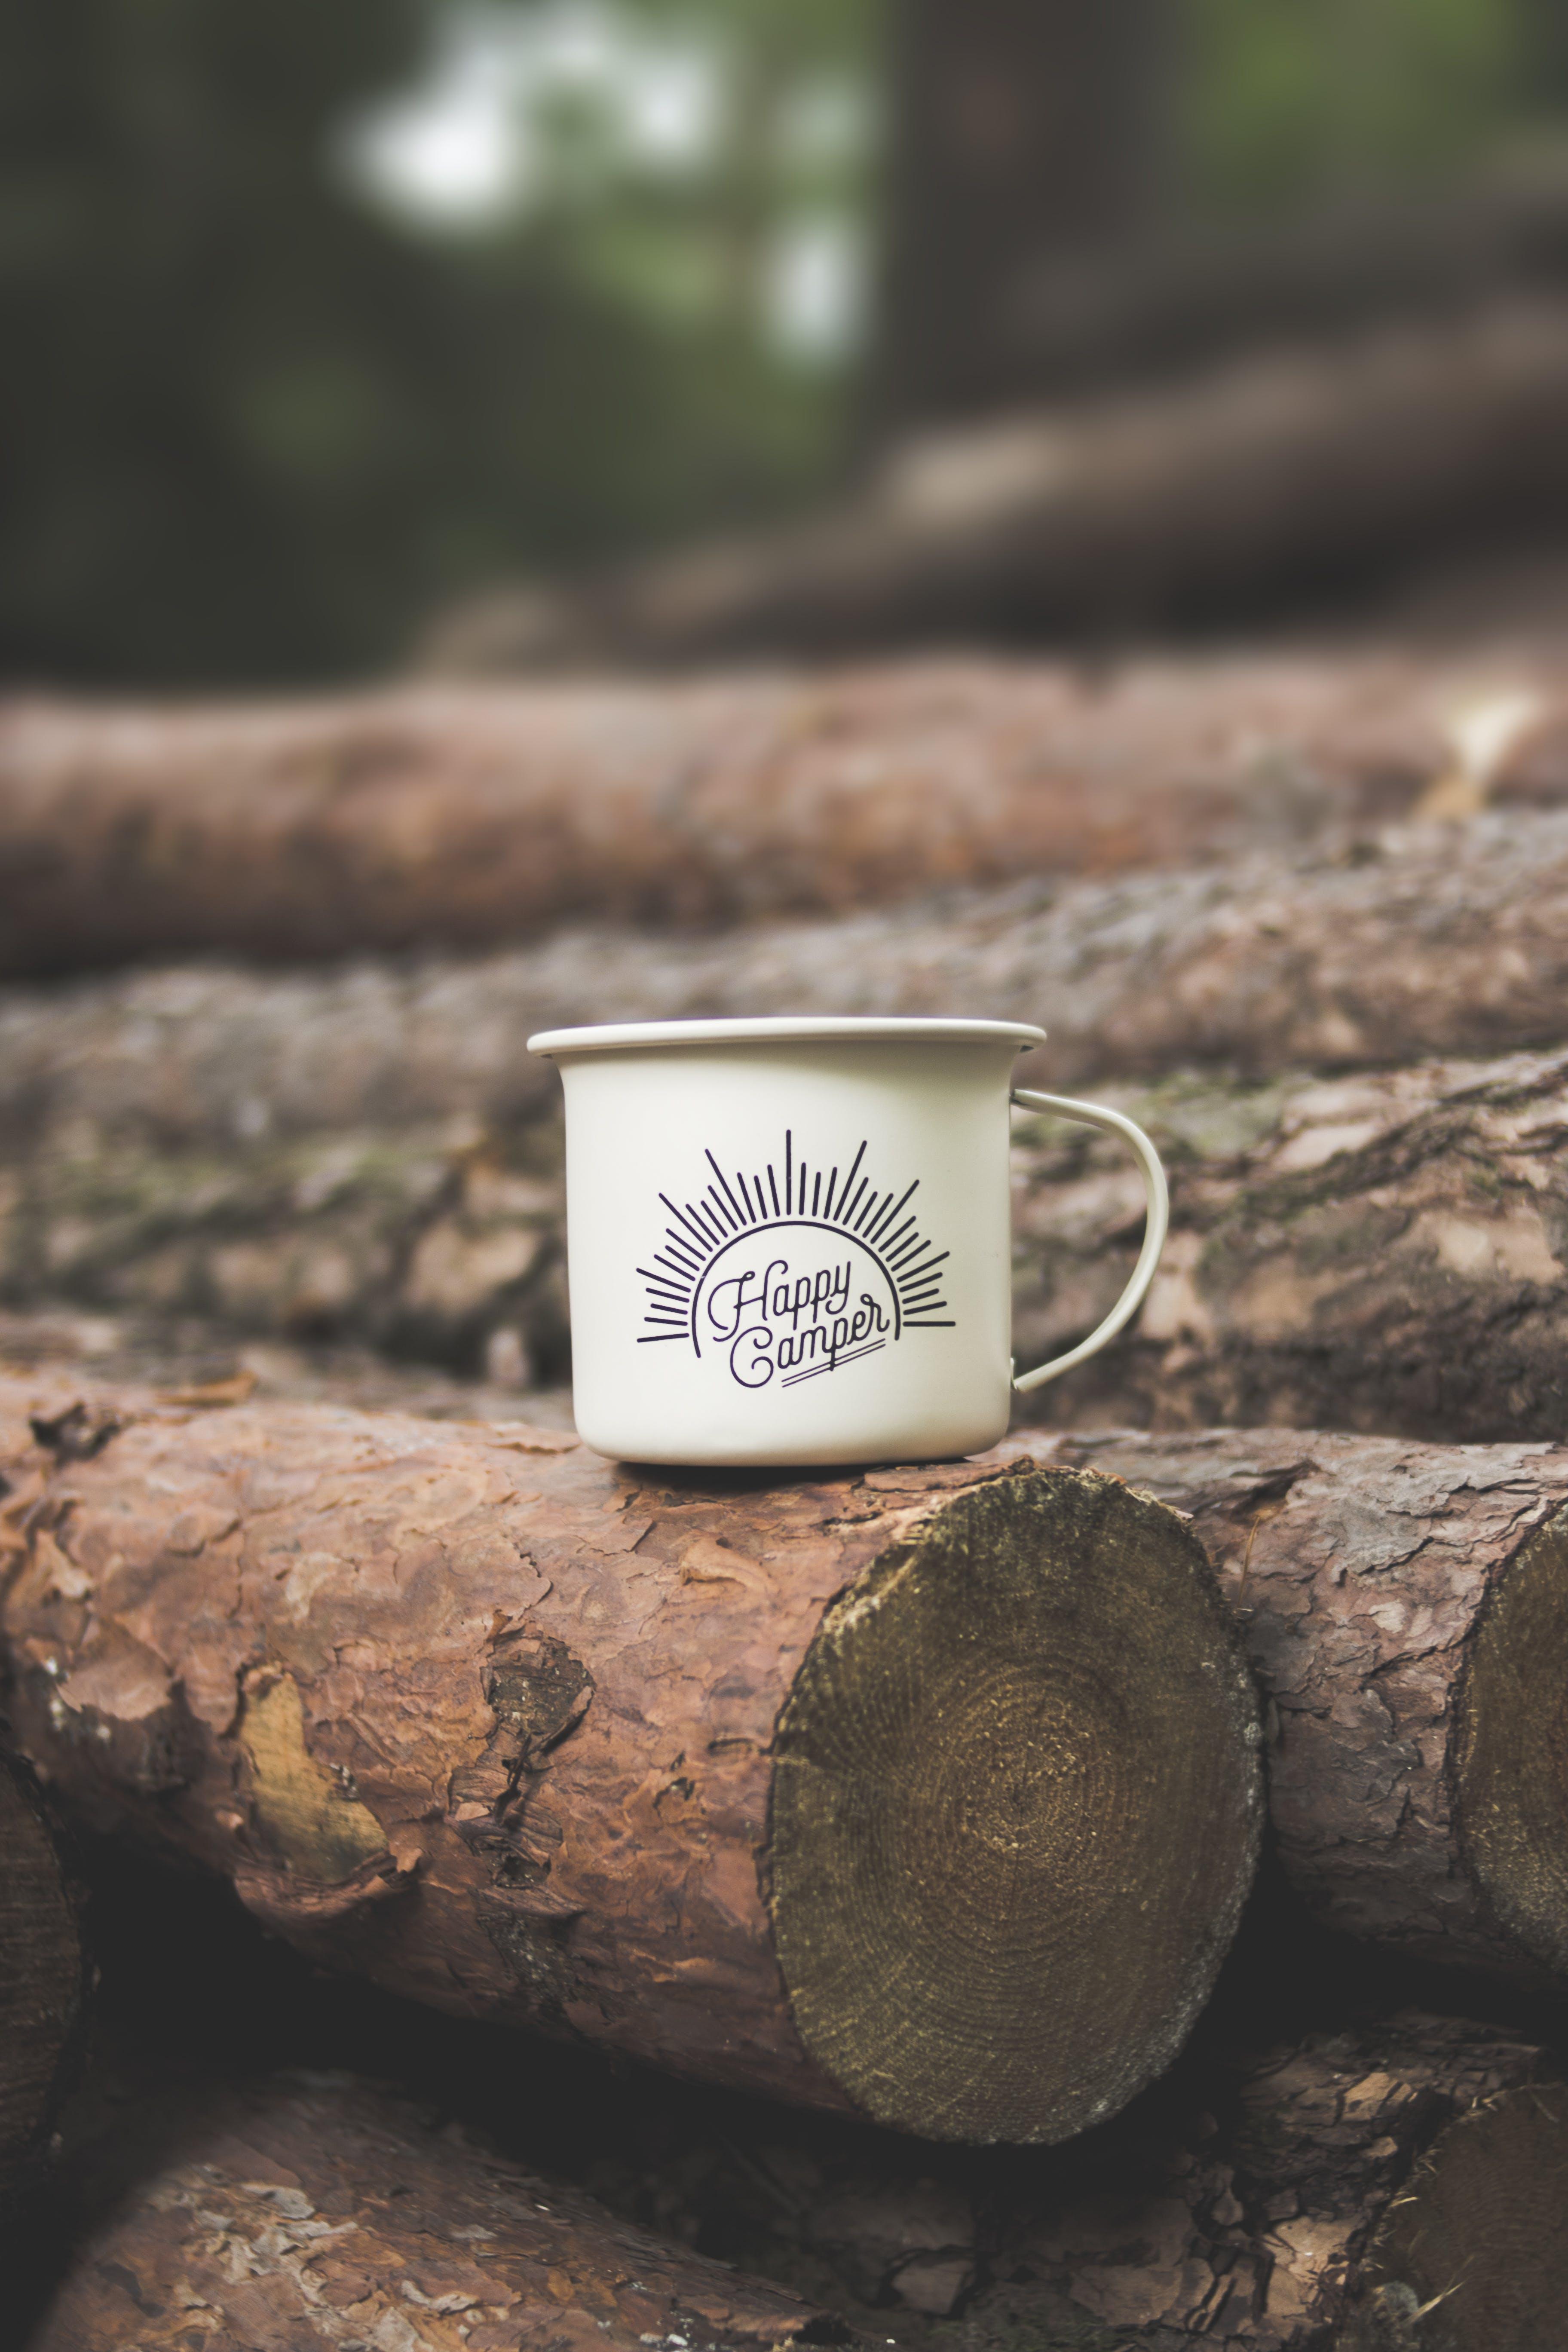 White Happy Camper-printed Cup on Brown Wooden Log